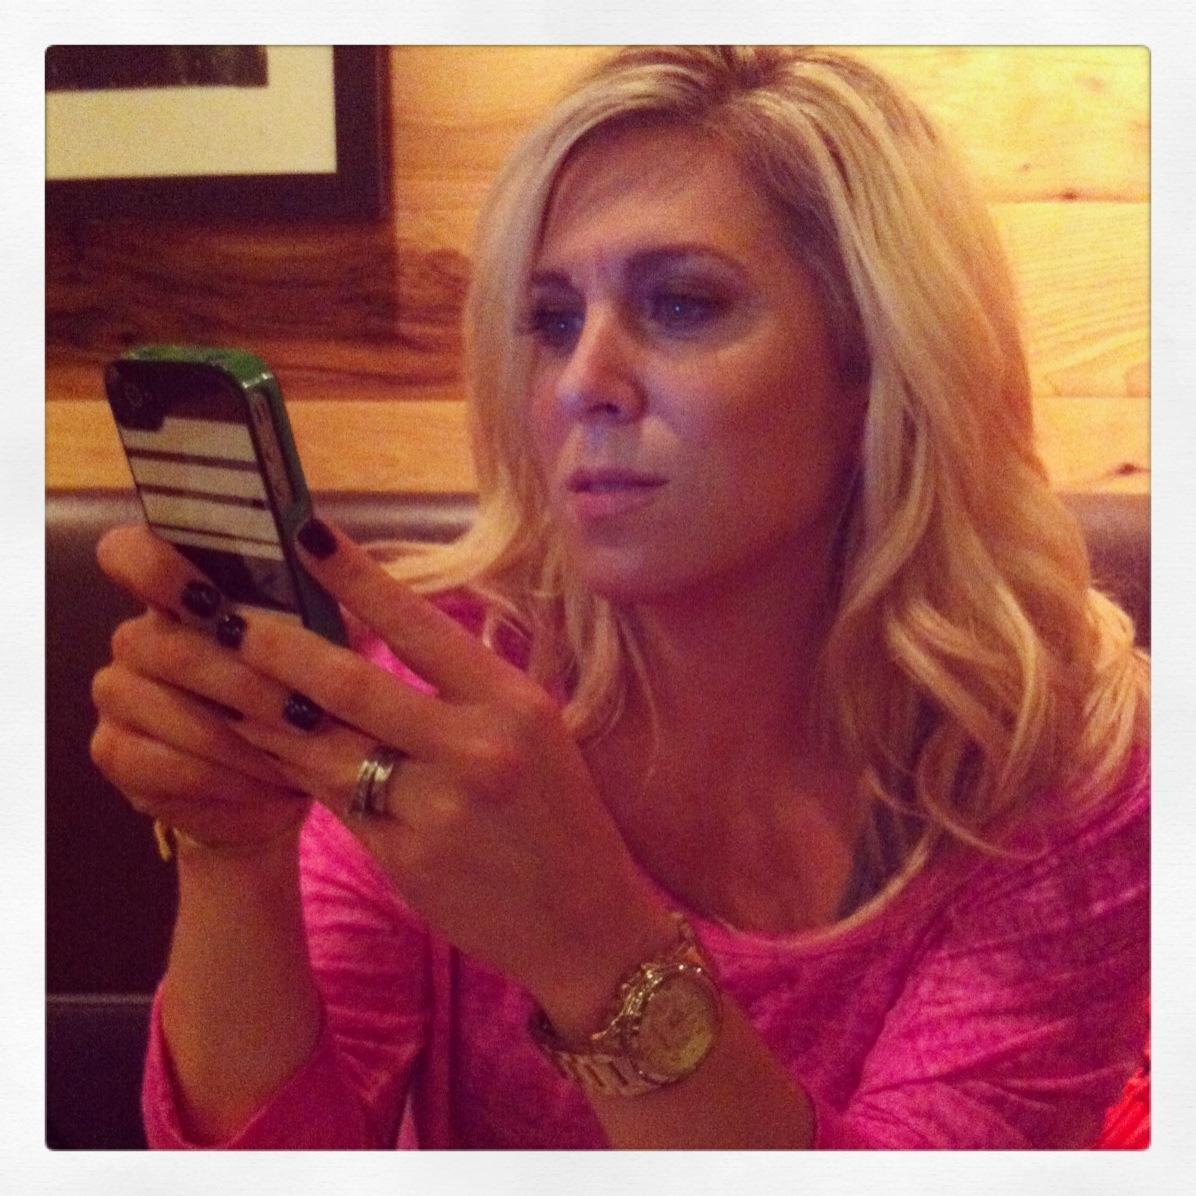 Audrey McClelland using phone